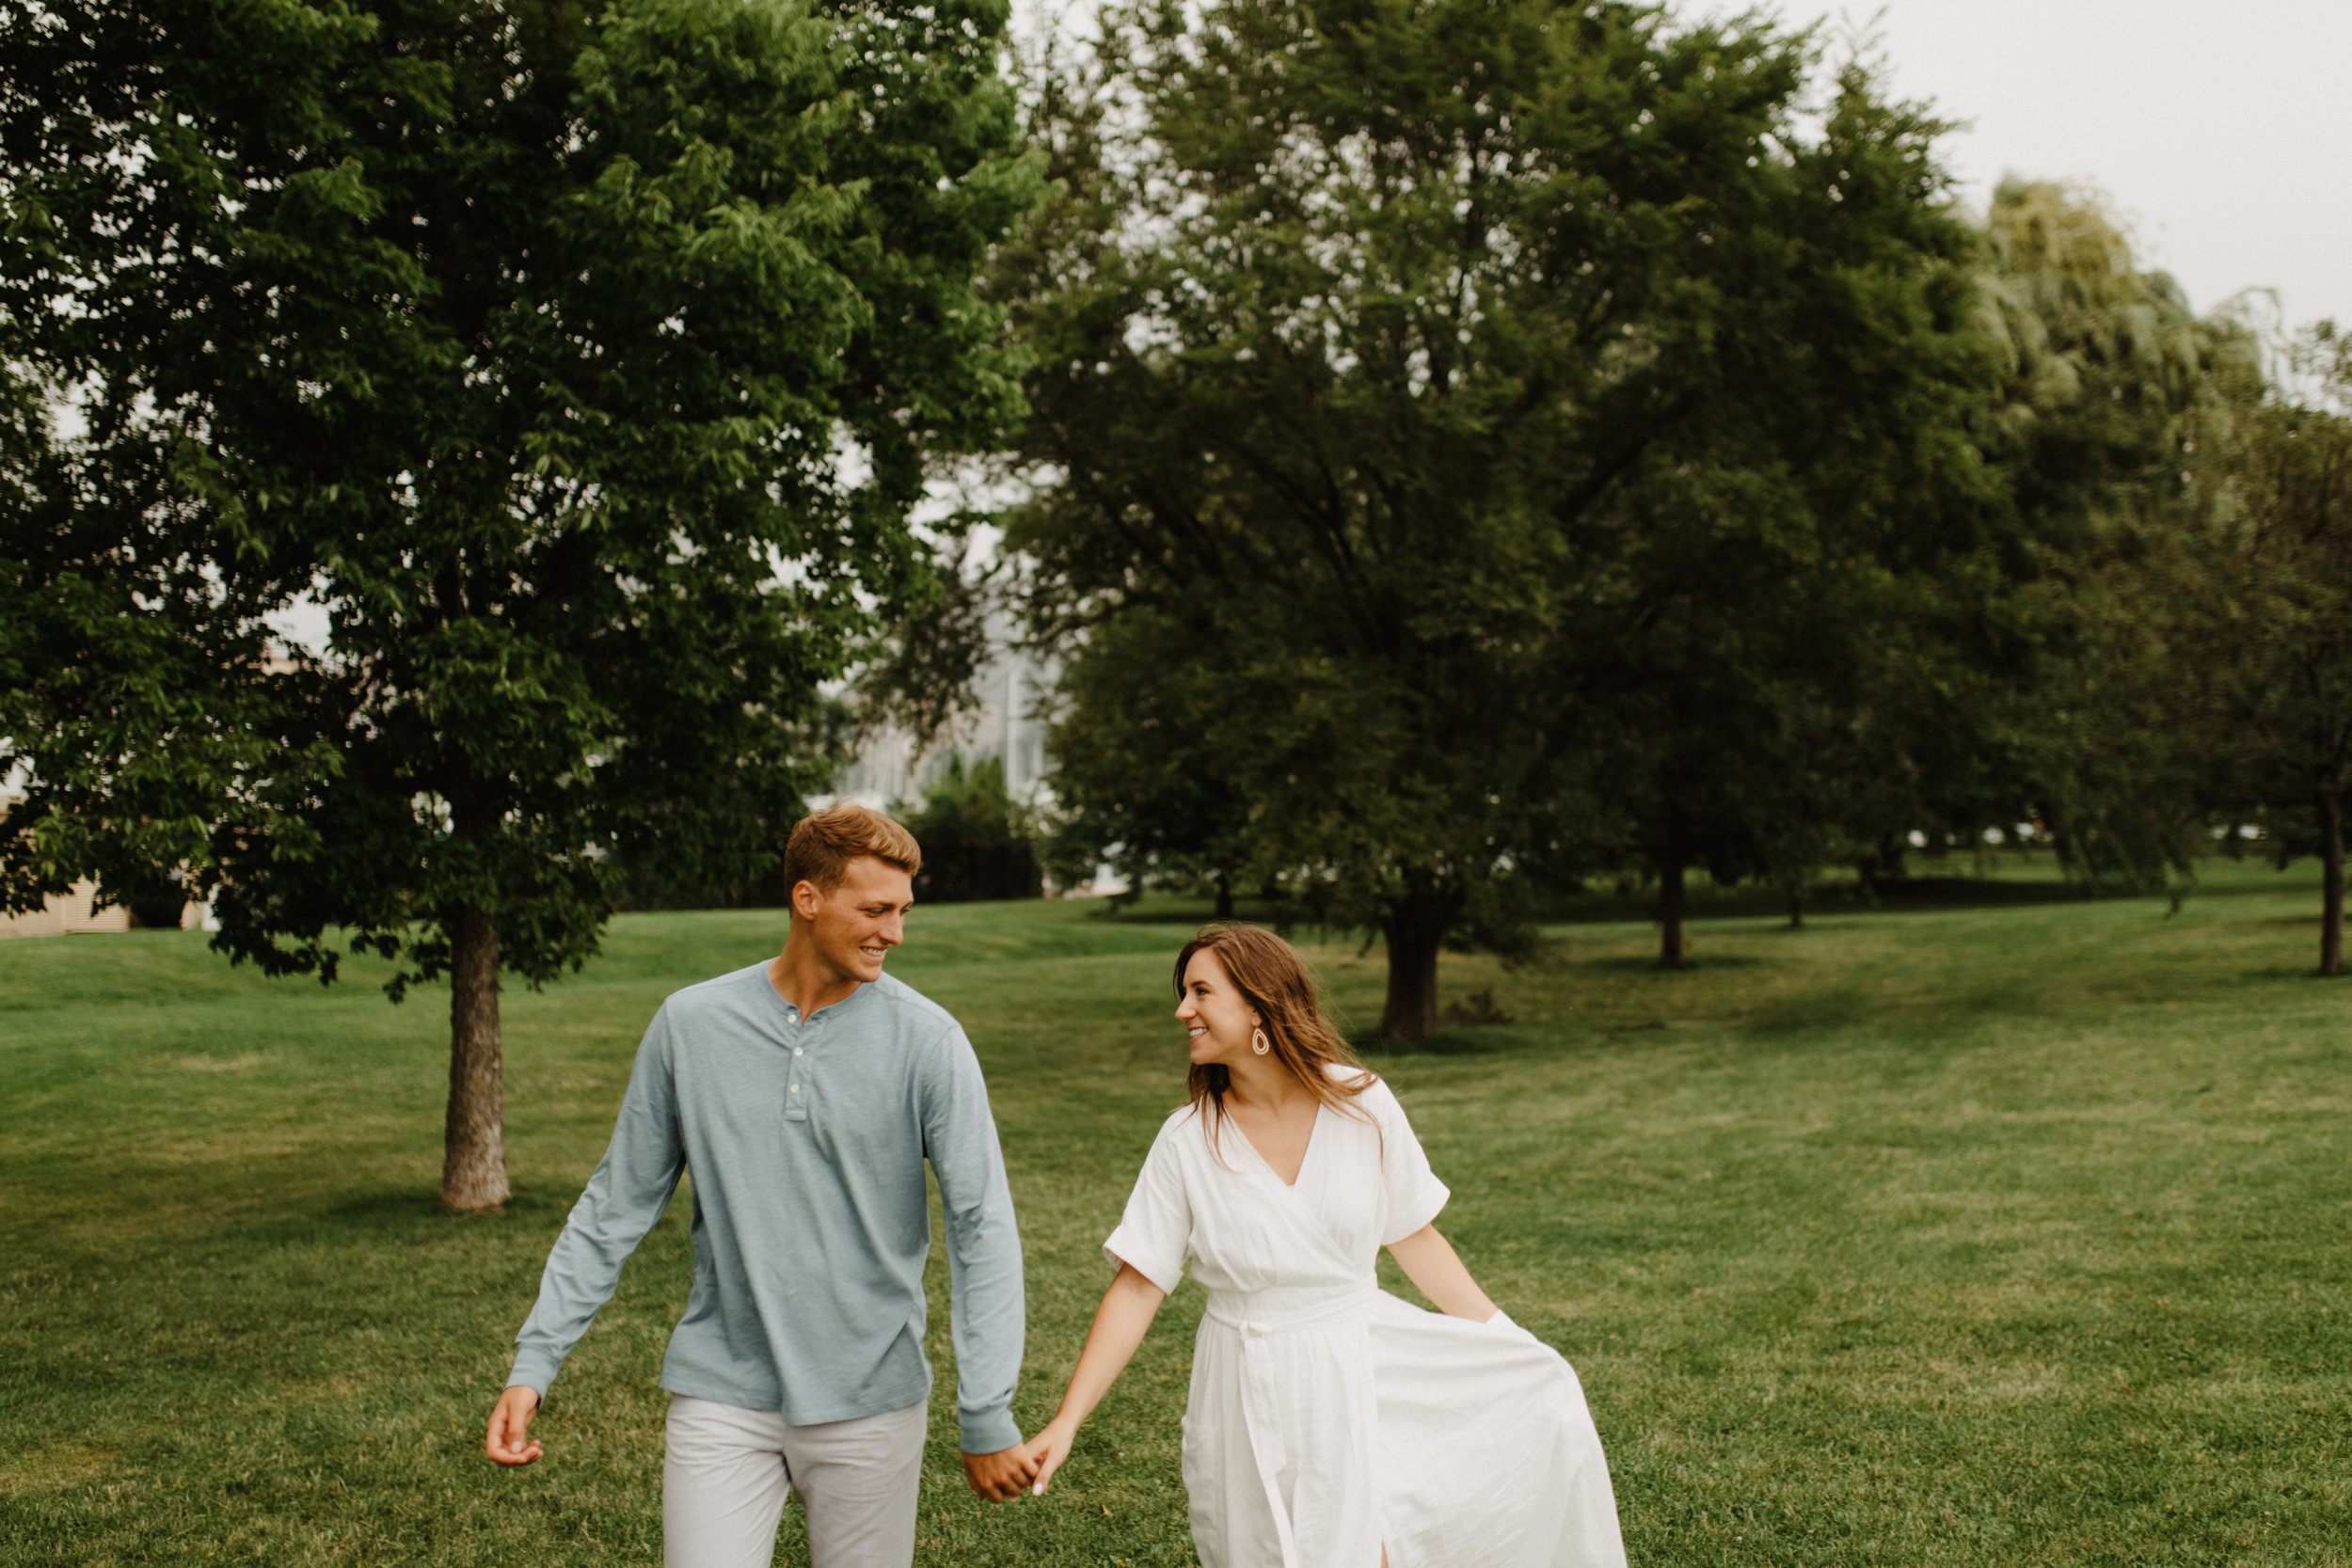 Taryn-Zak-Chicago-Engagement-41